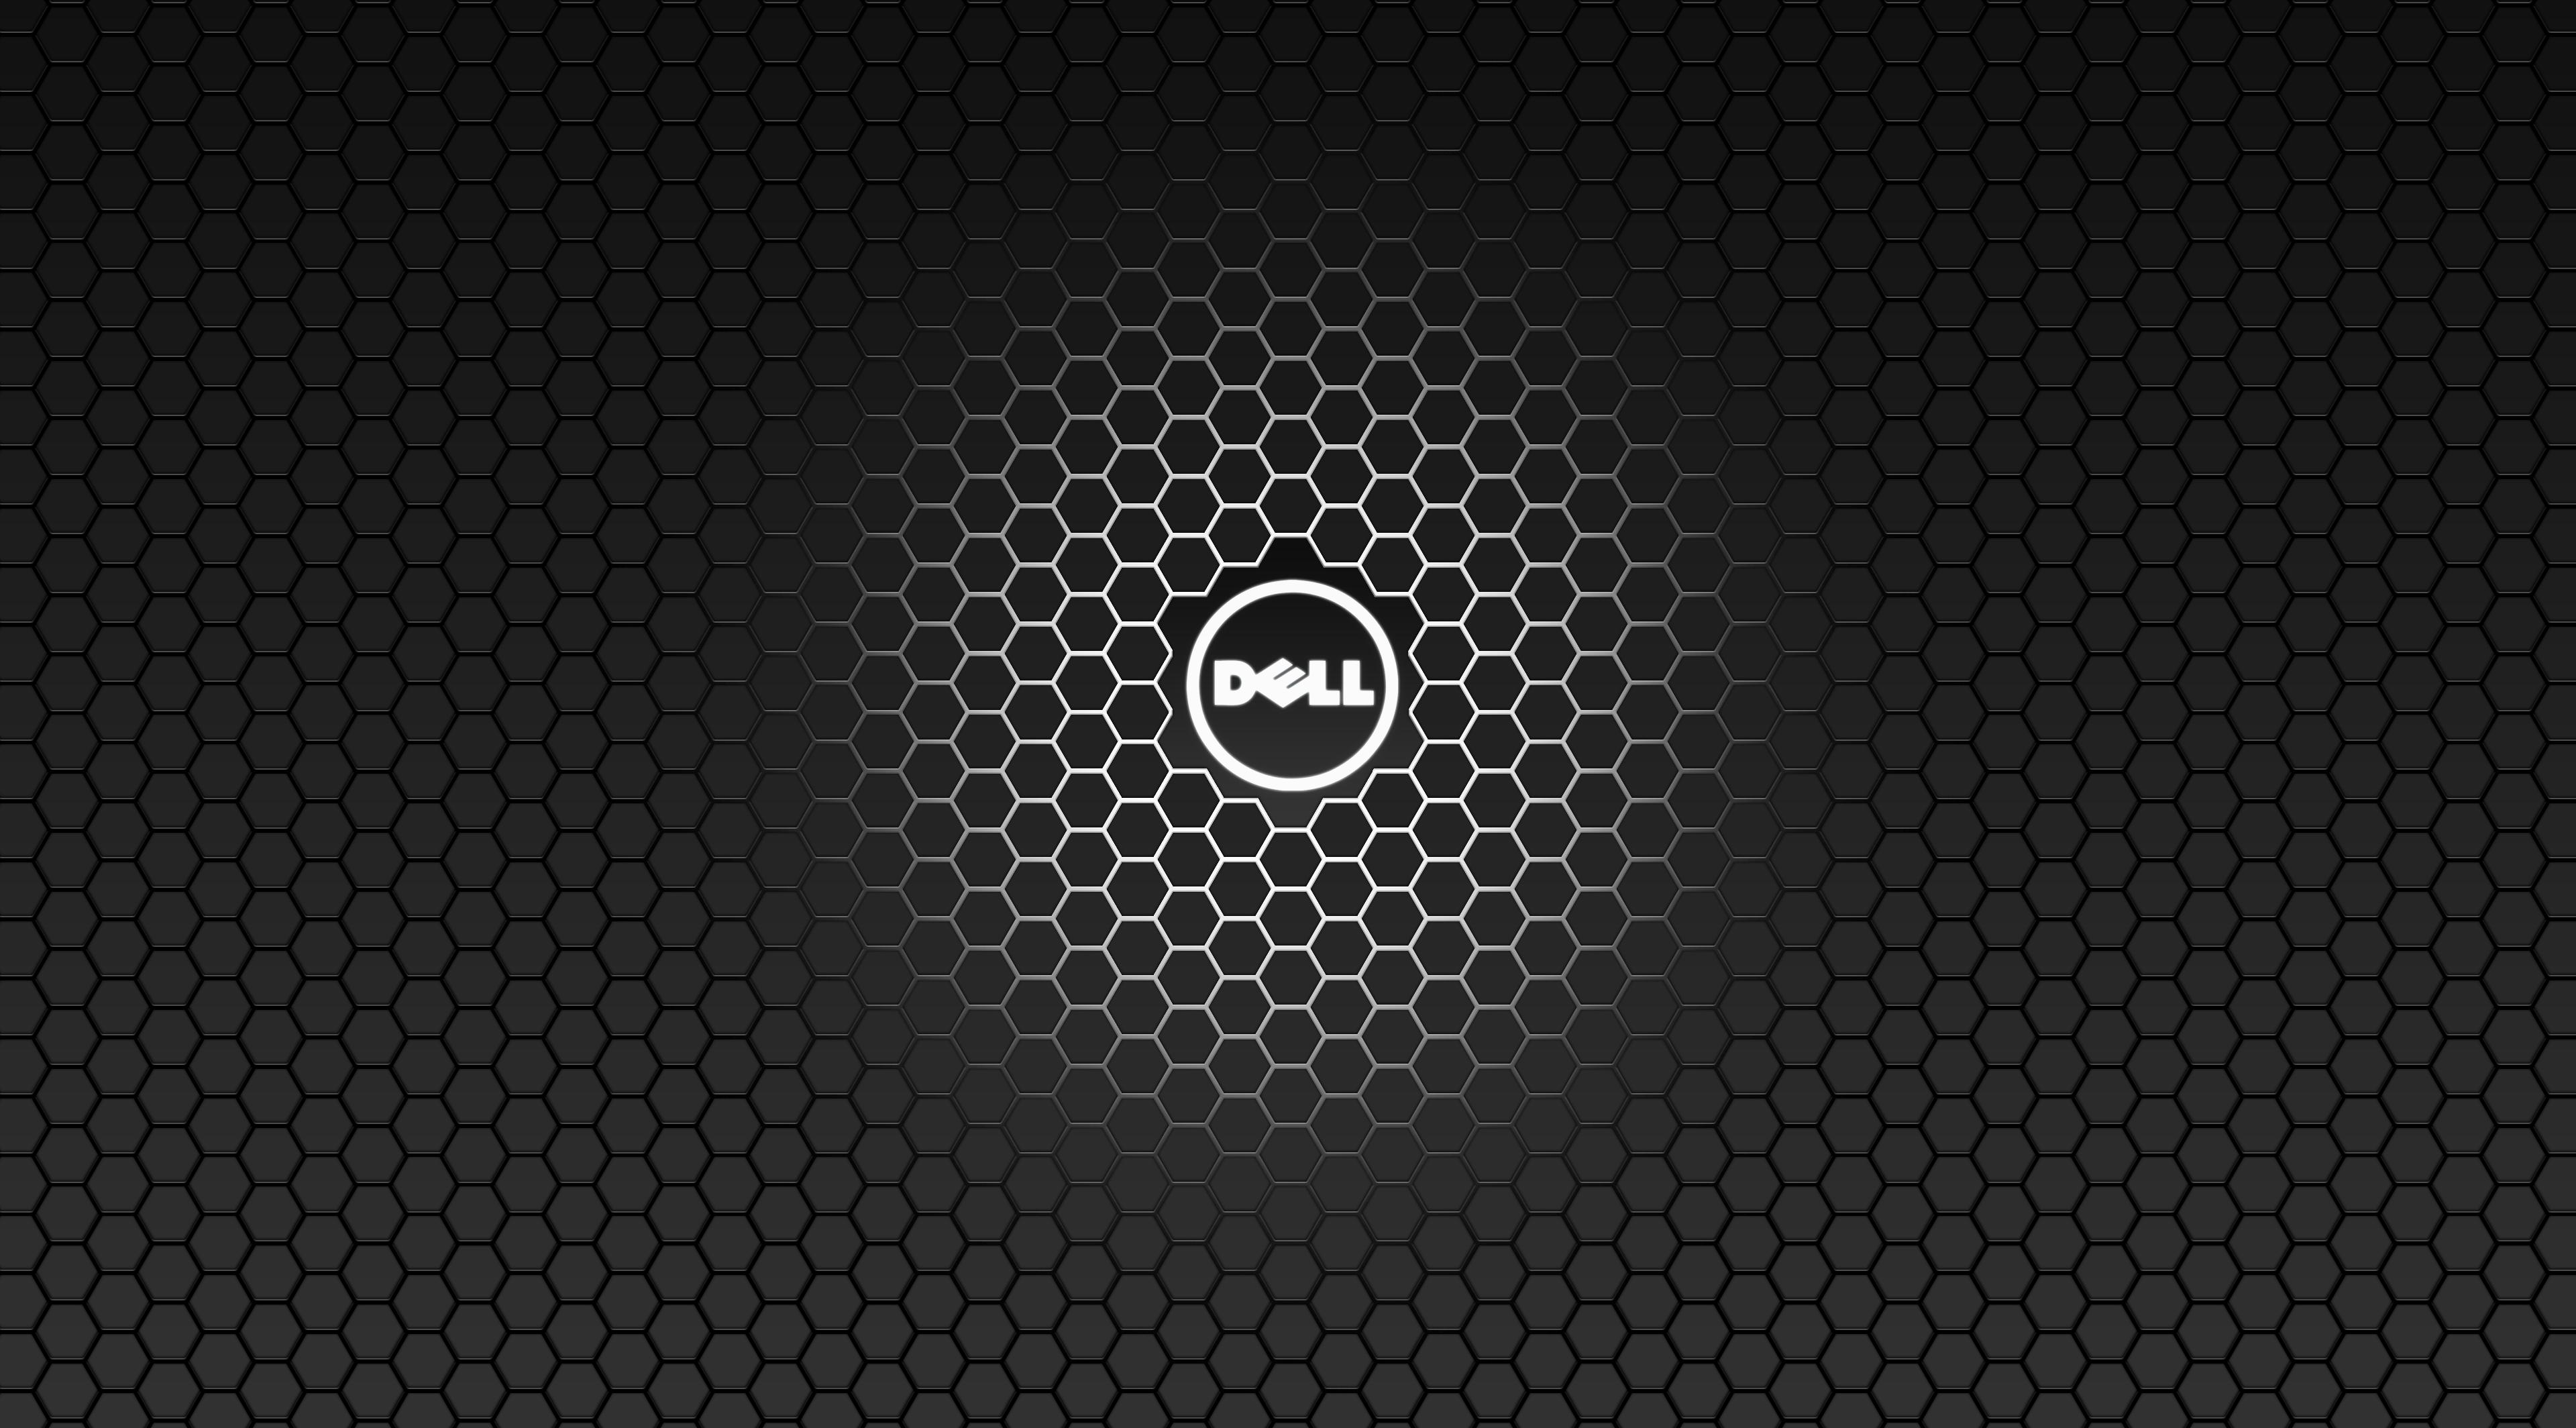 dell logo hexagonal carbon fiber pattern desktop wallpaper